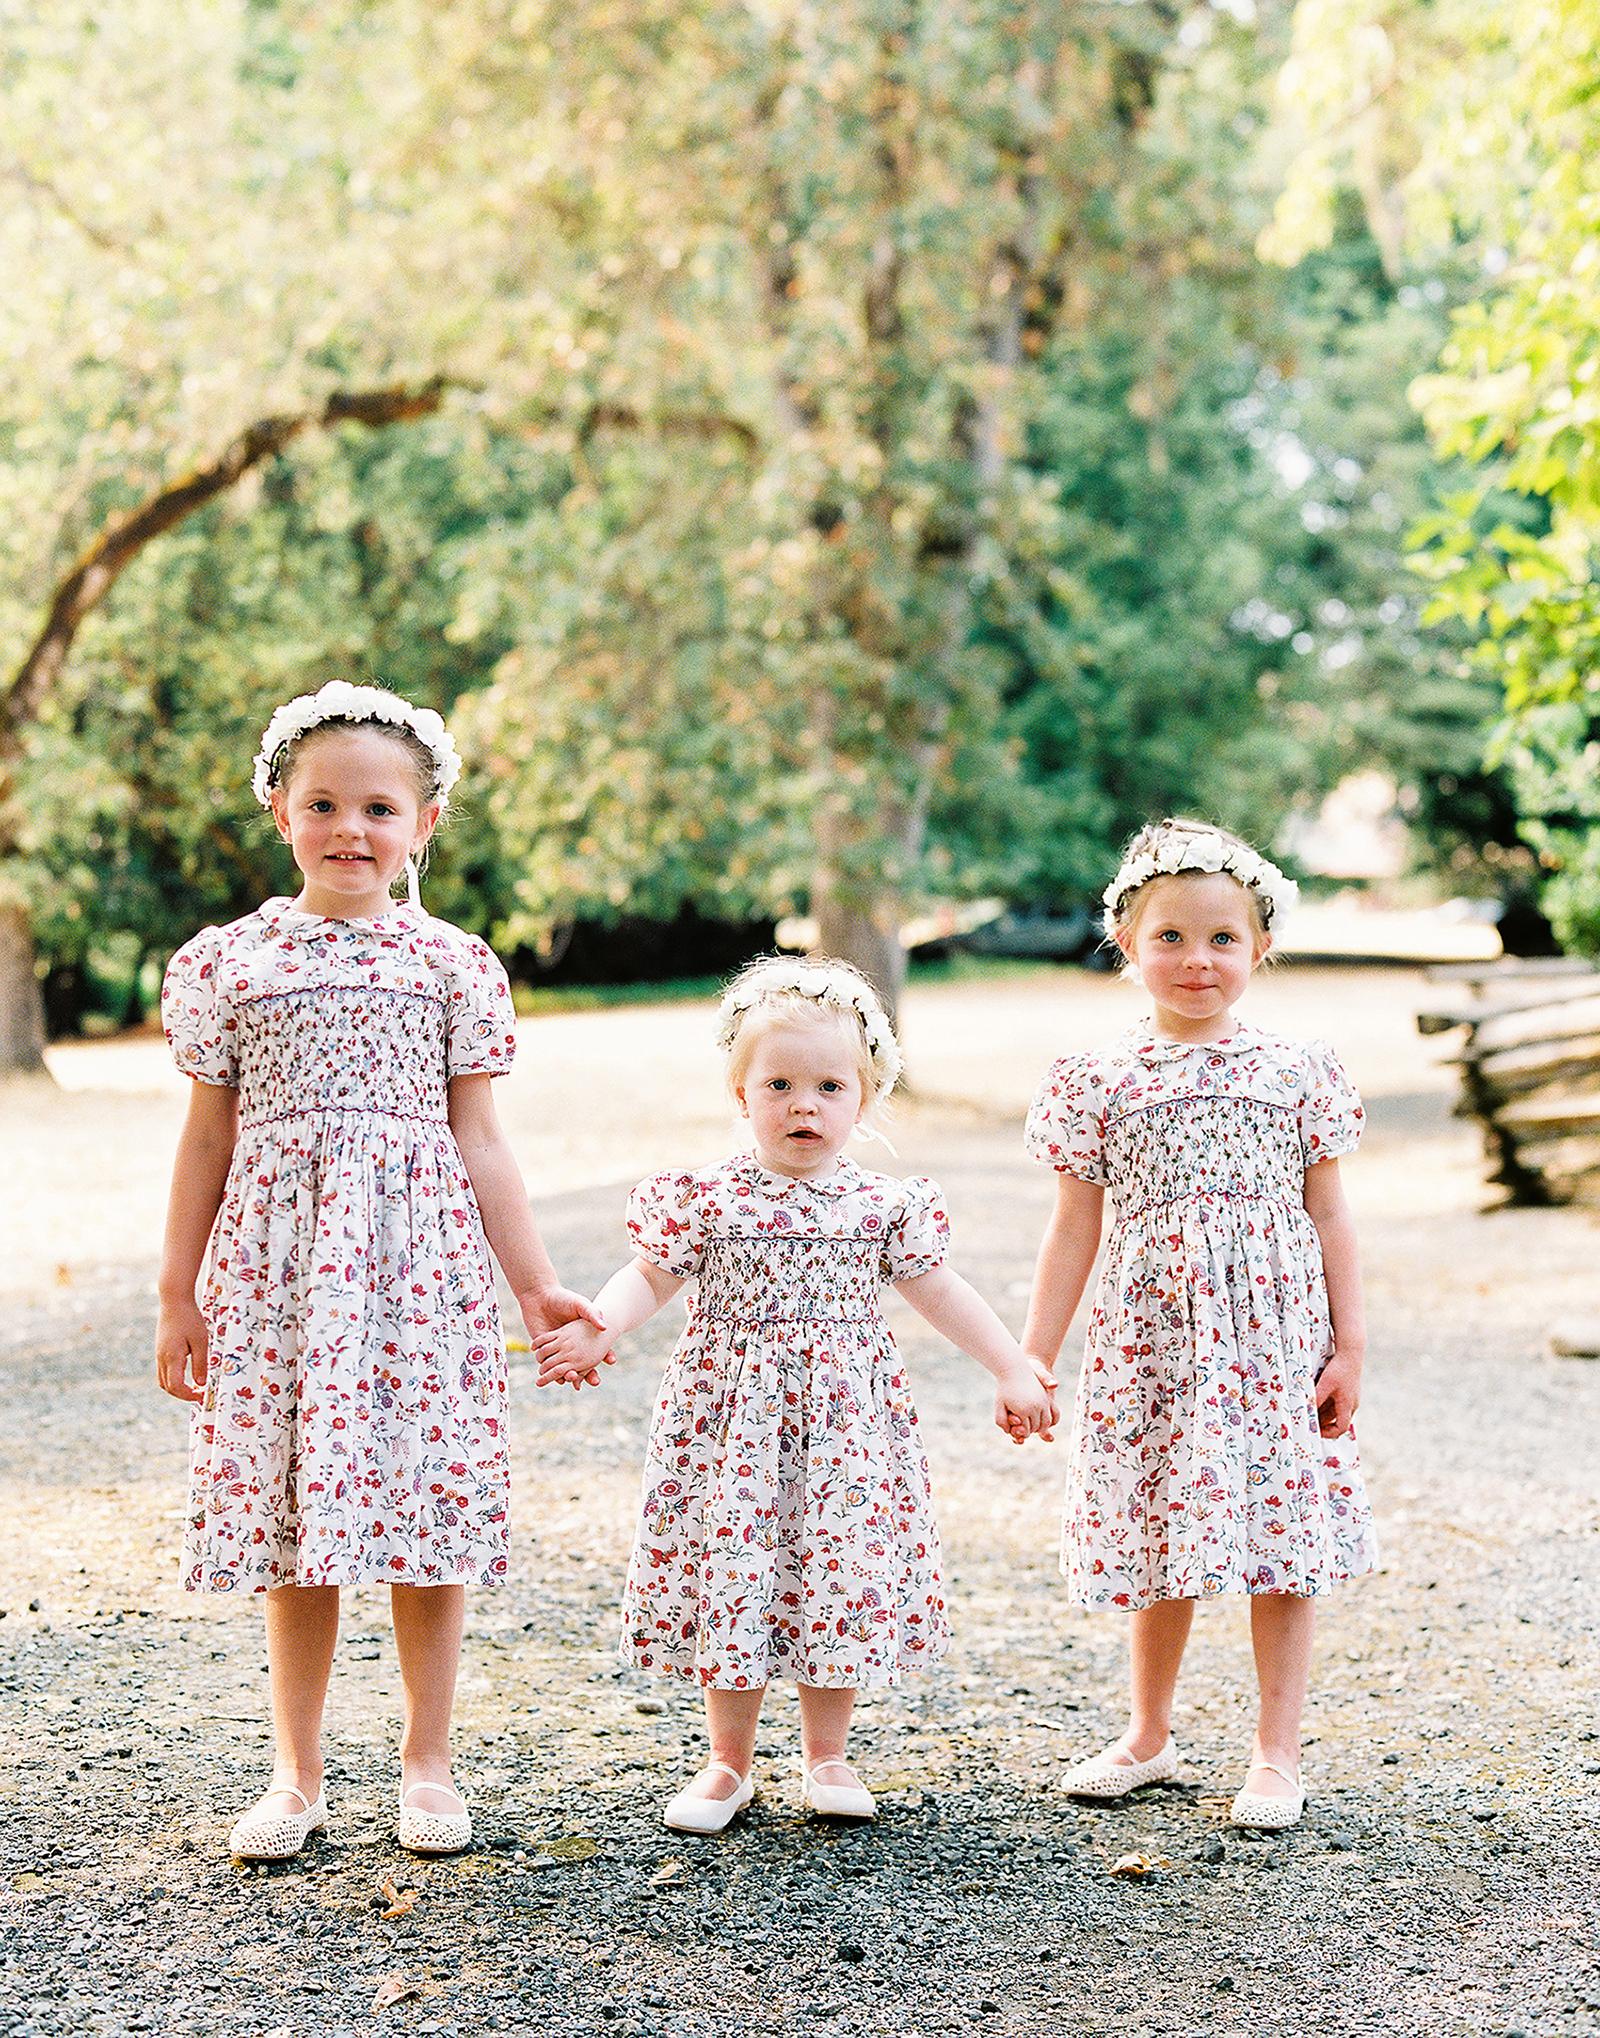 three flower girls wearing floral dresses